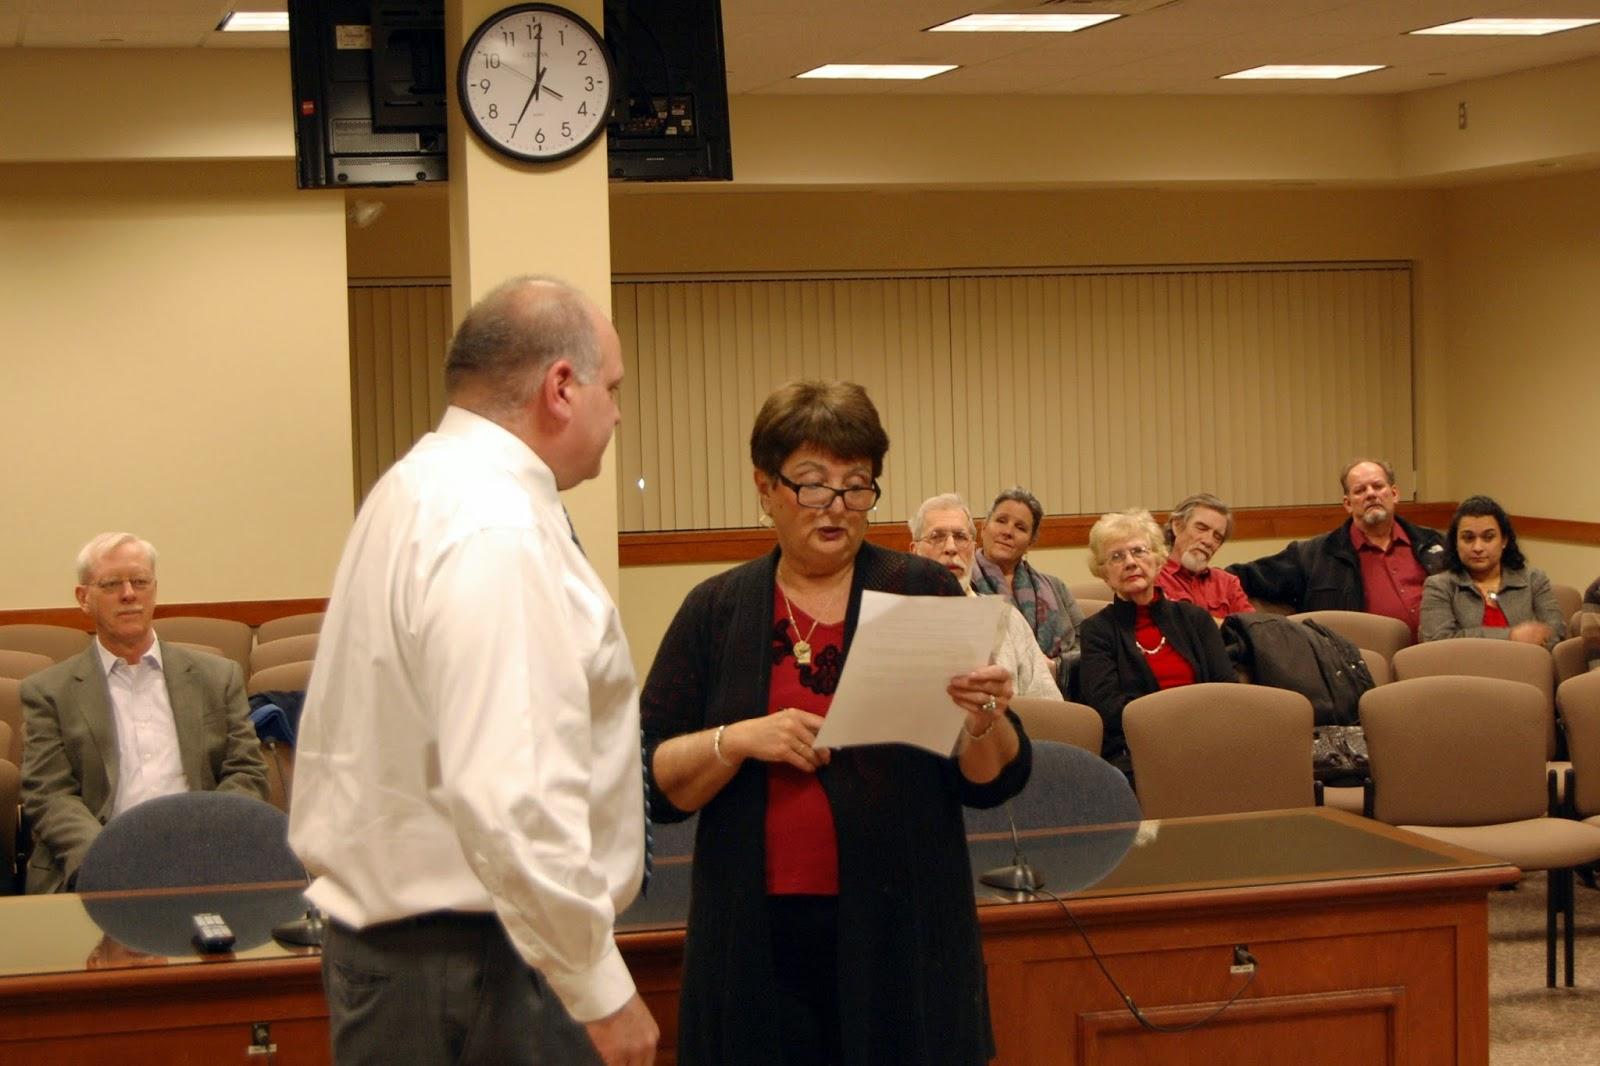 newly elected Town Councilor Robert Dellorco and Town Clerk Deboroah Pellegri